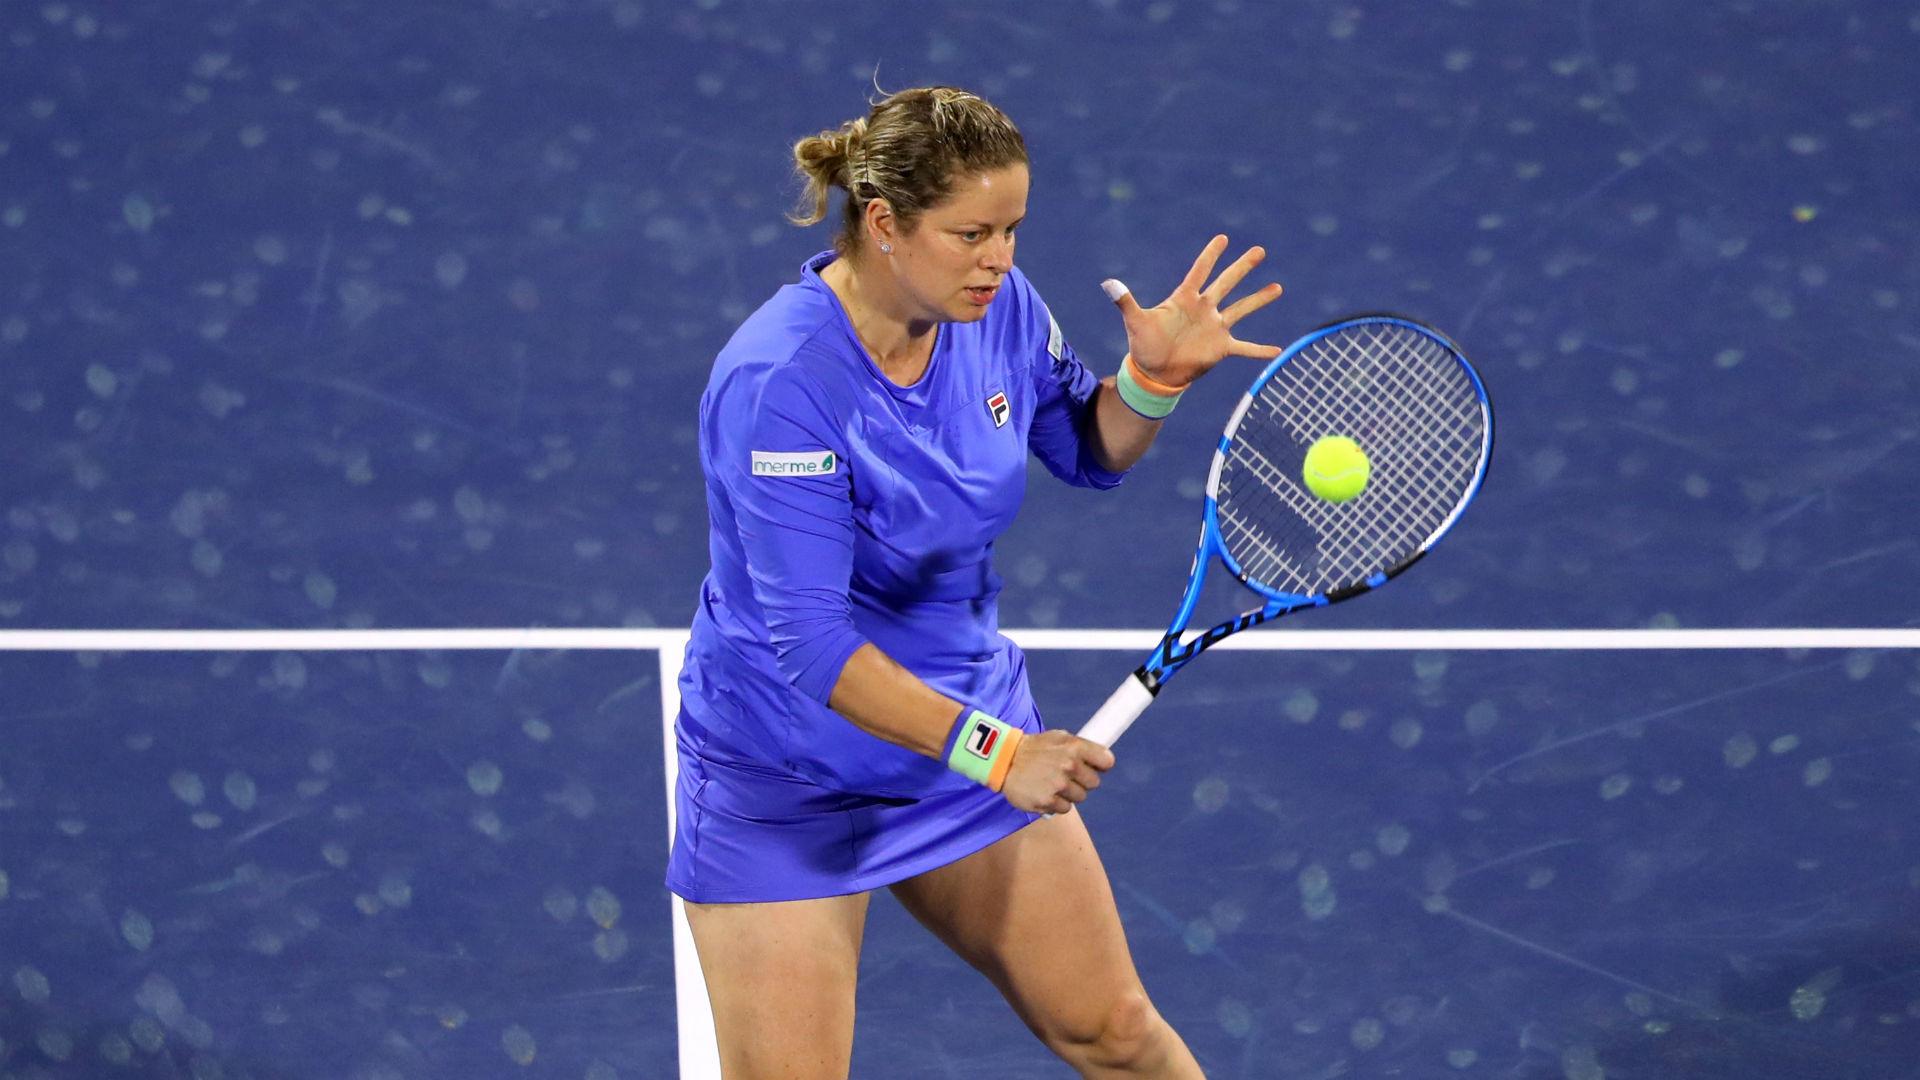 Kim Clijsters suffers defeat to Muguruza on encouraging WTA Tour comeback